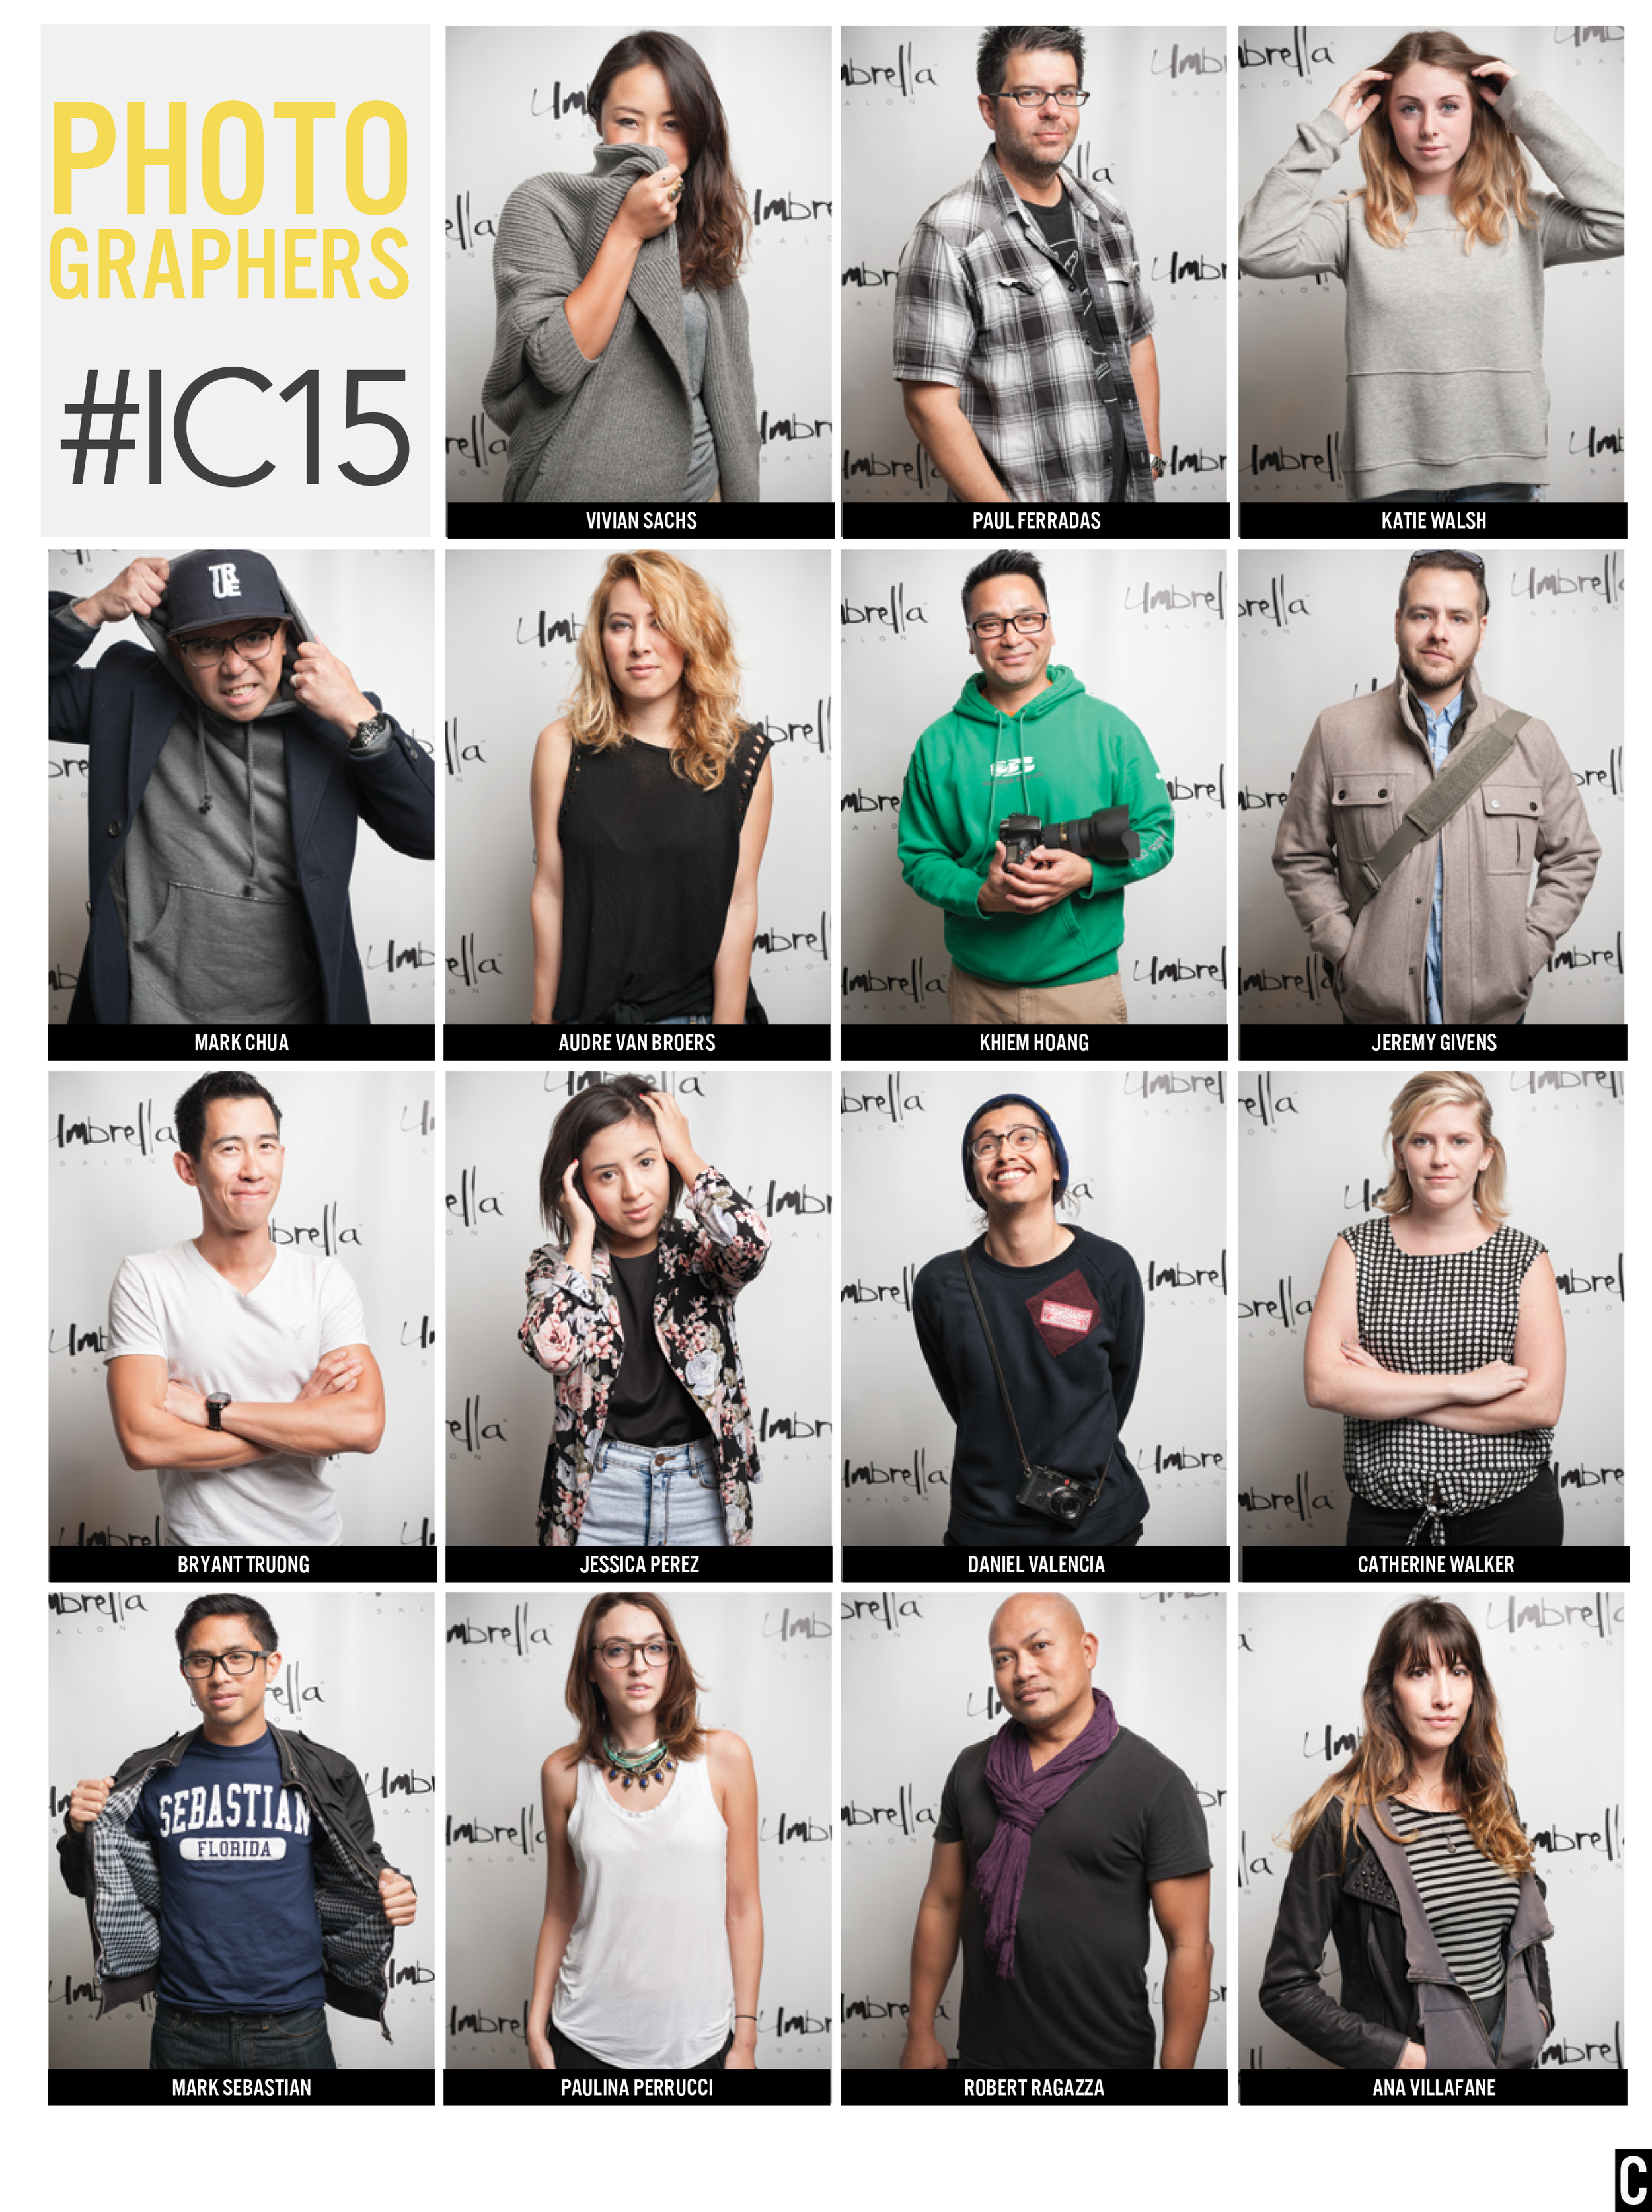 #IC15 PHOTOGRAPHERS